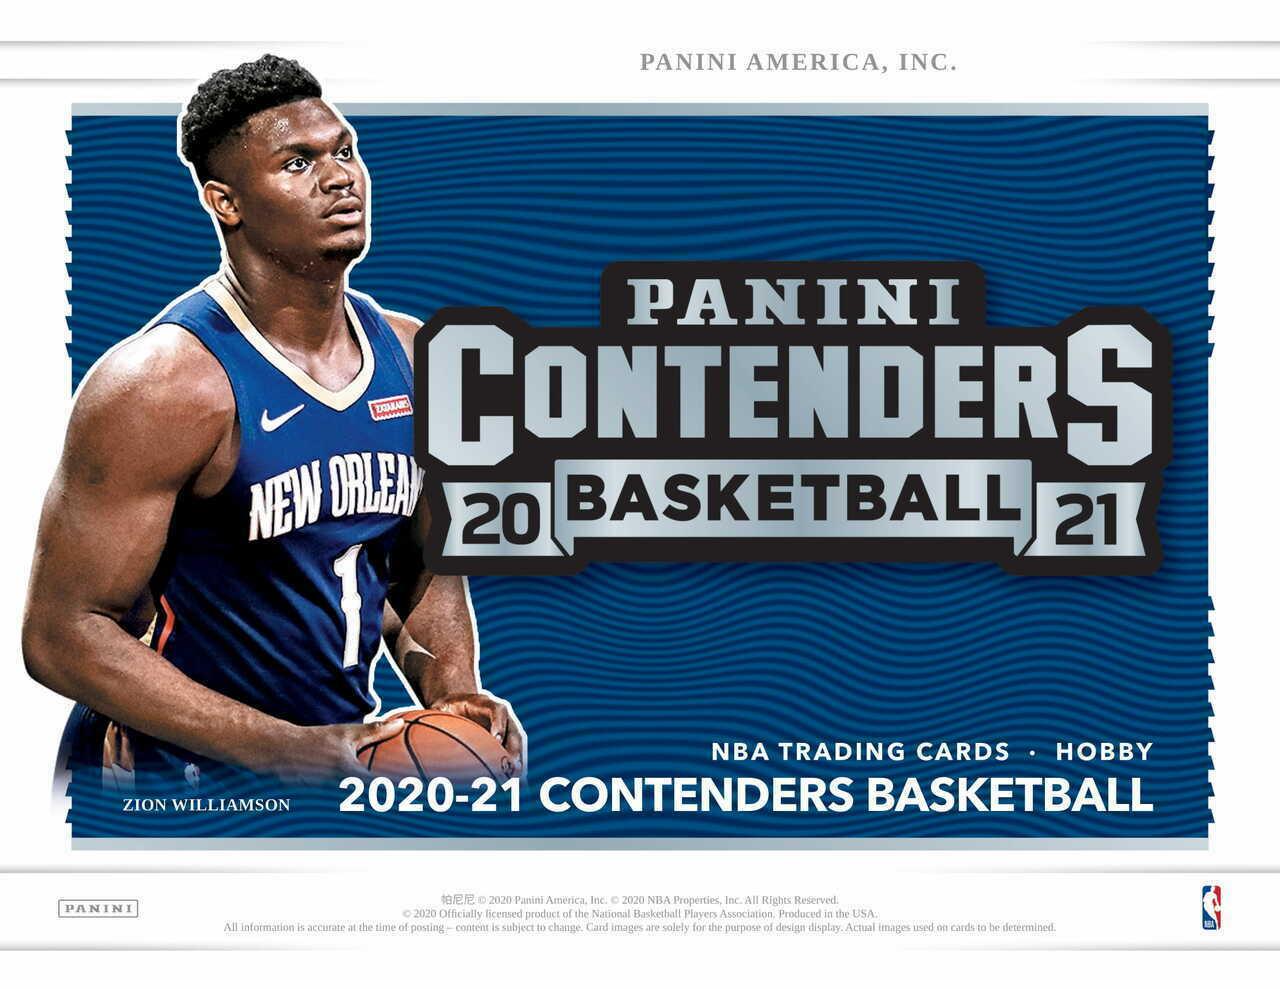 2020-21 Panini Basketball Contenders